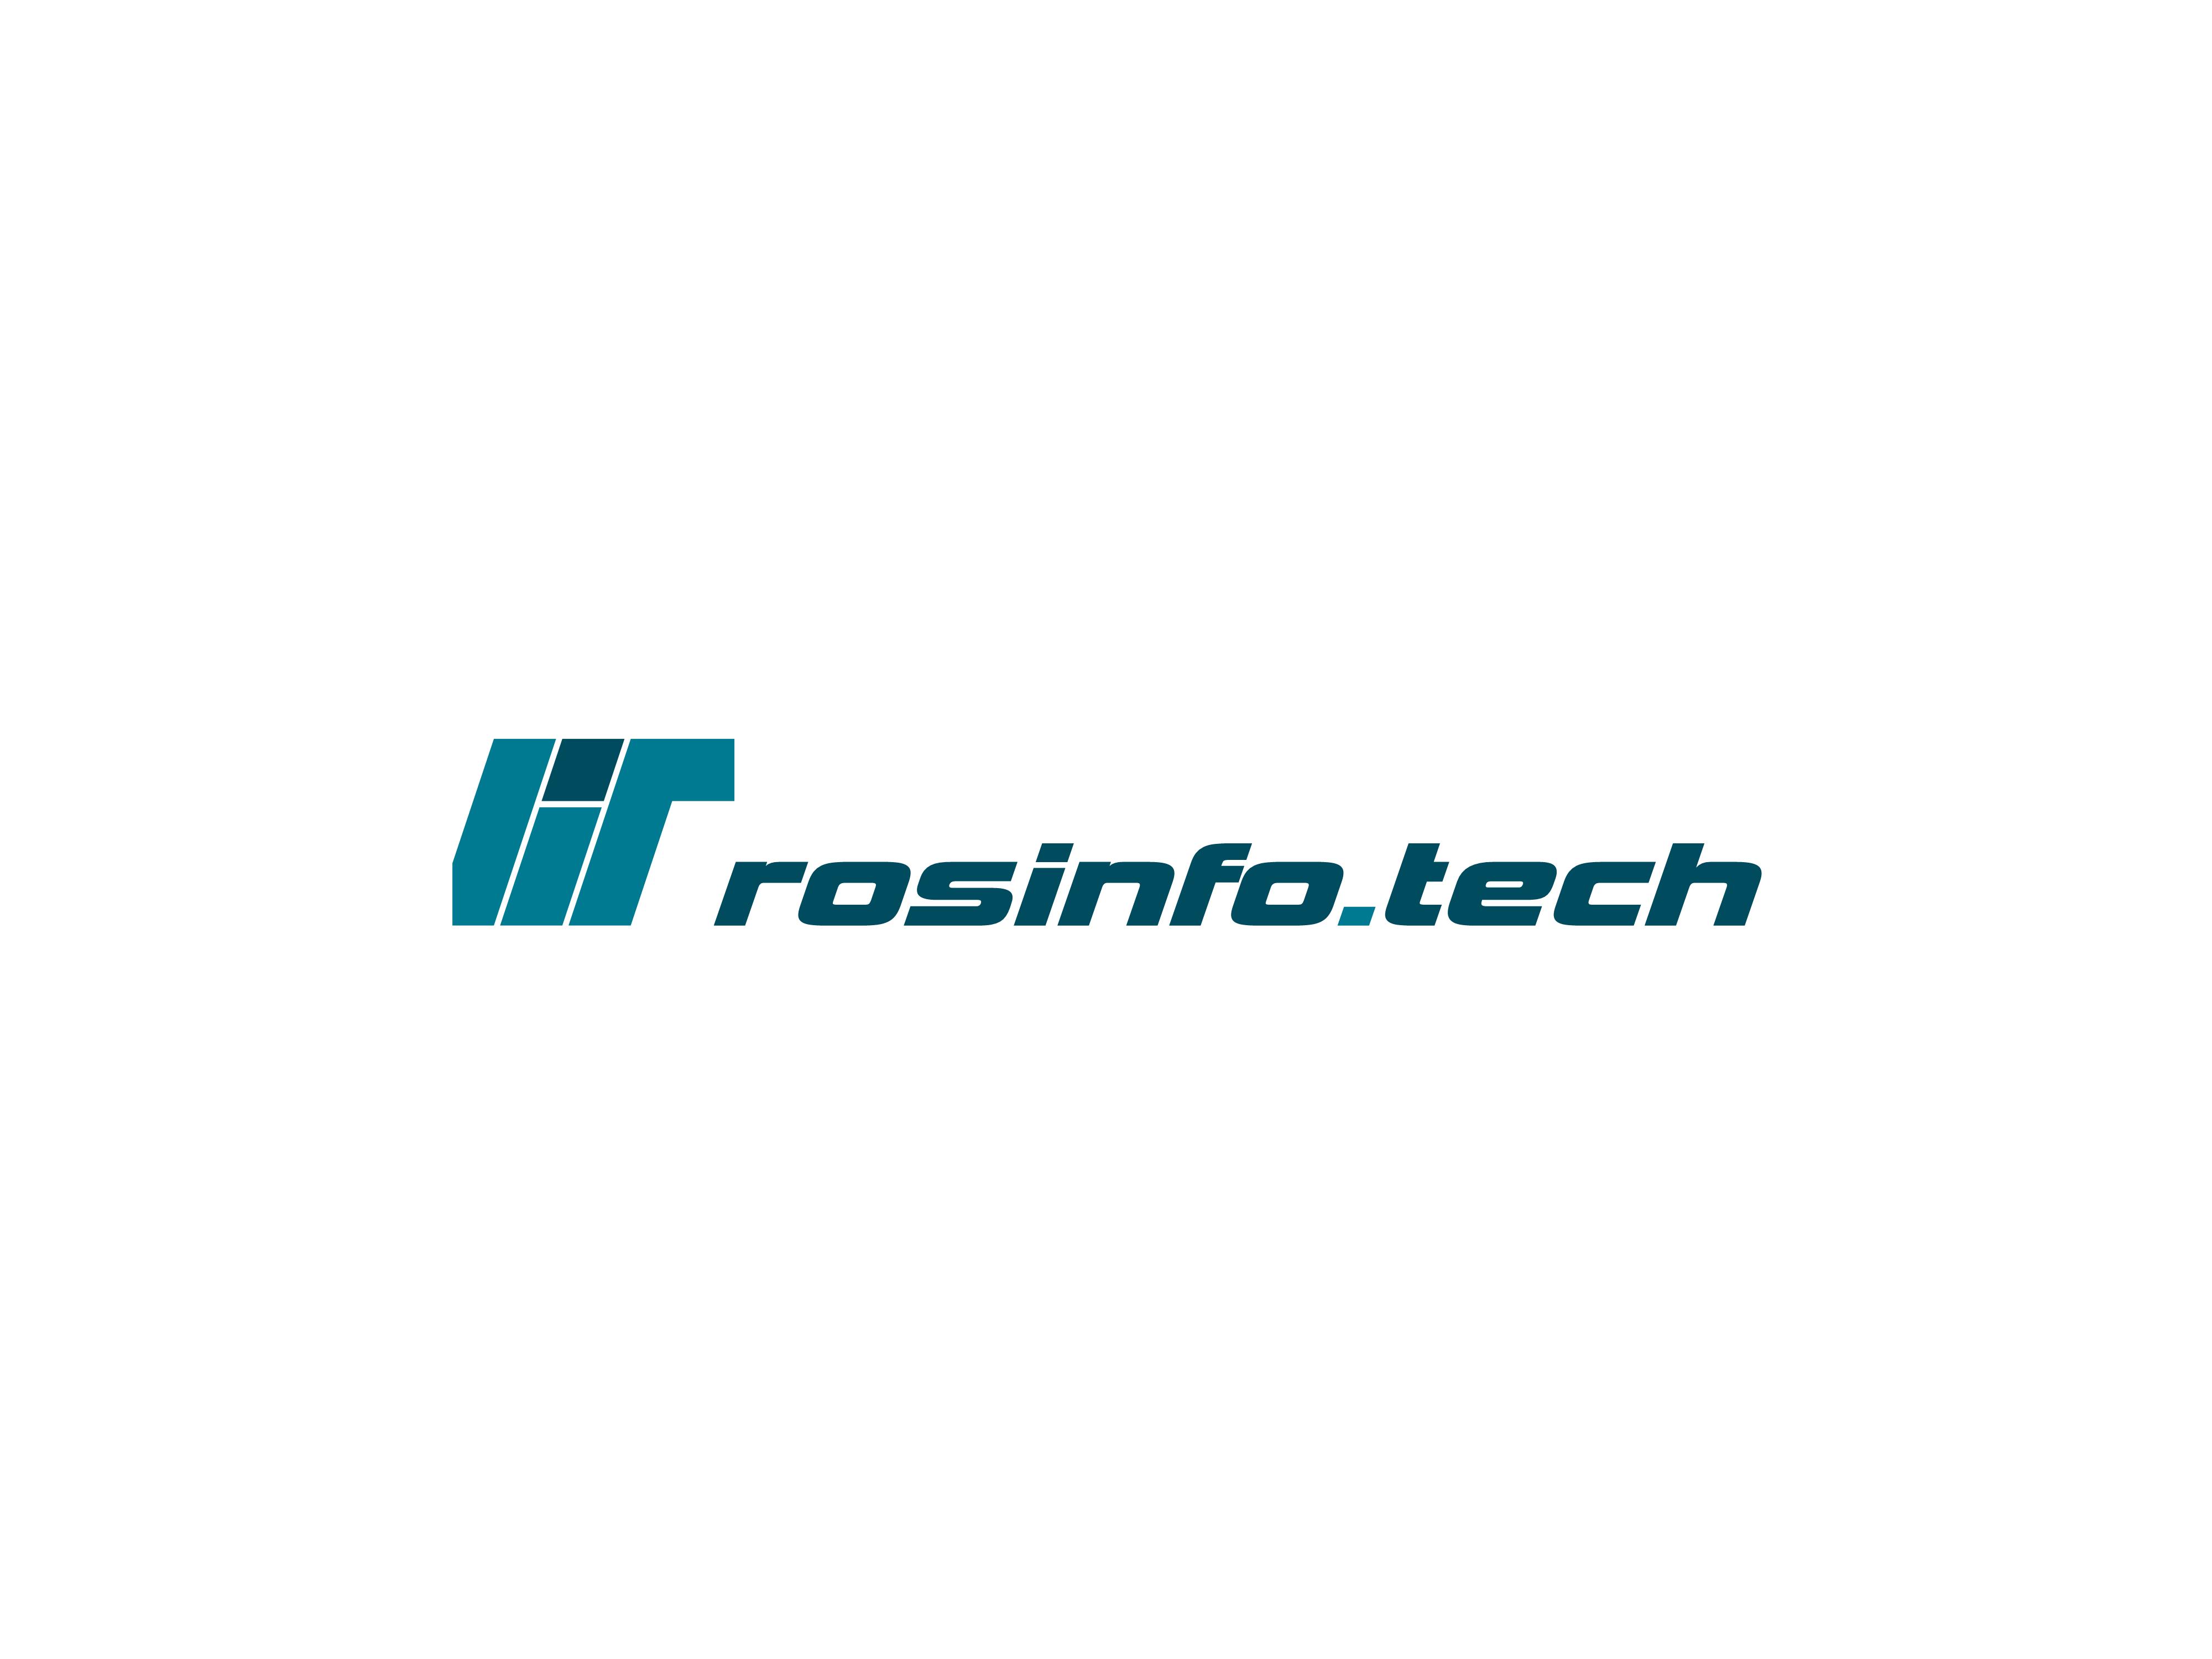 Разработка пакета айдентики rosinfo.tech фото f_7275e2b4e94f1be2.png